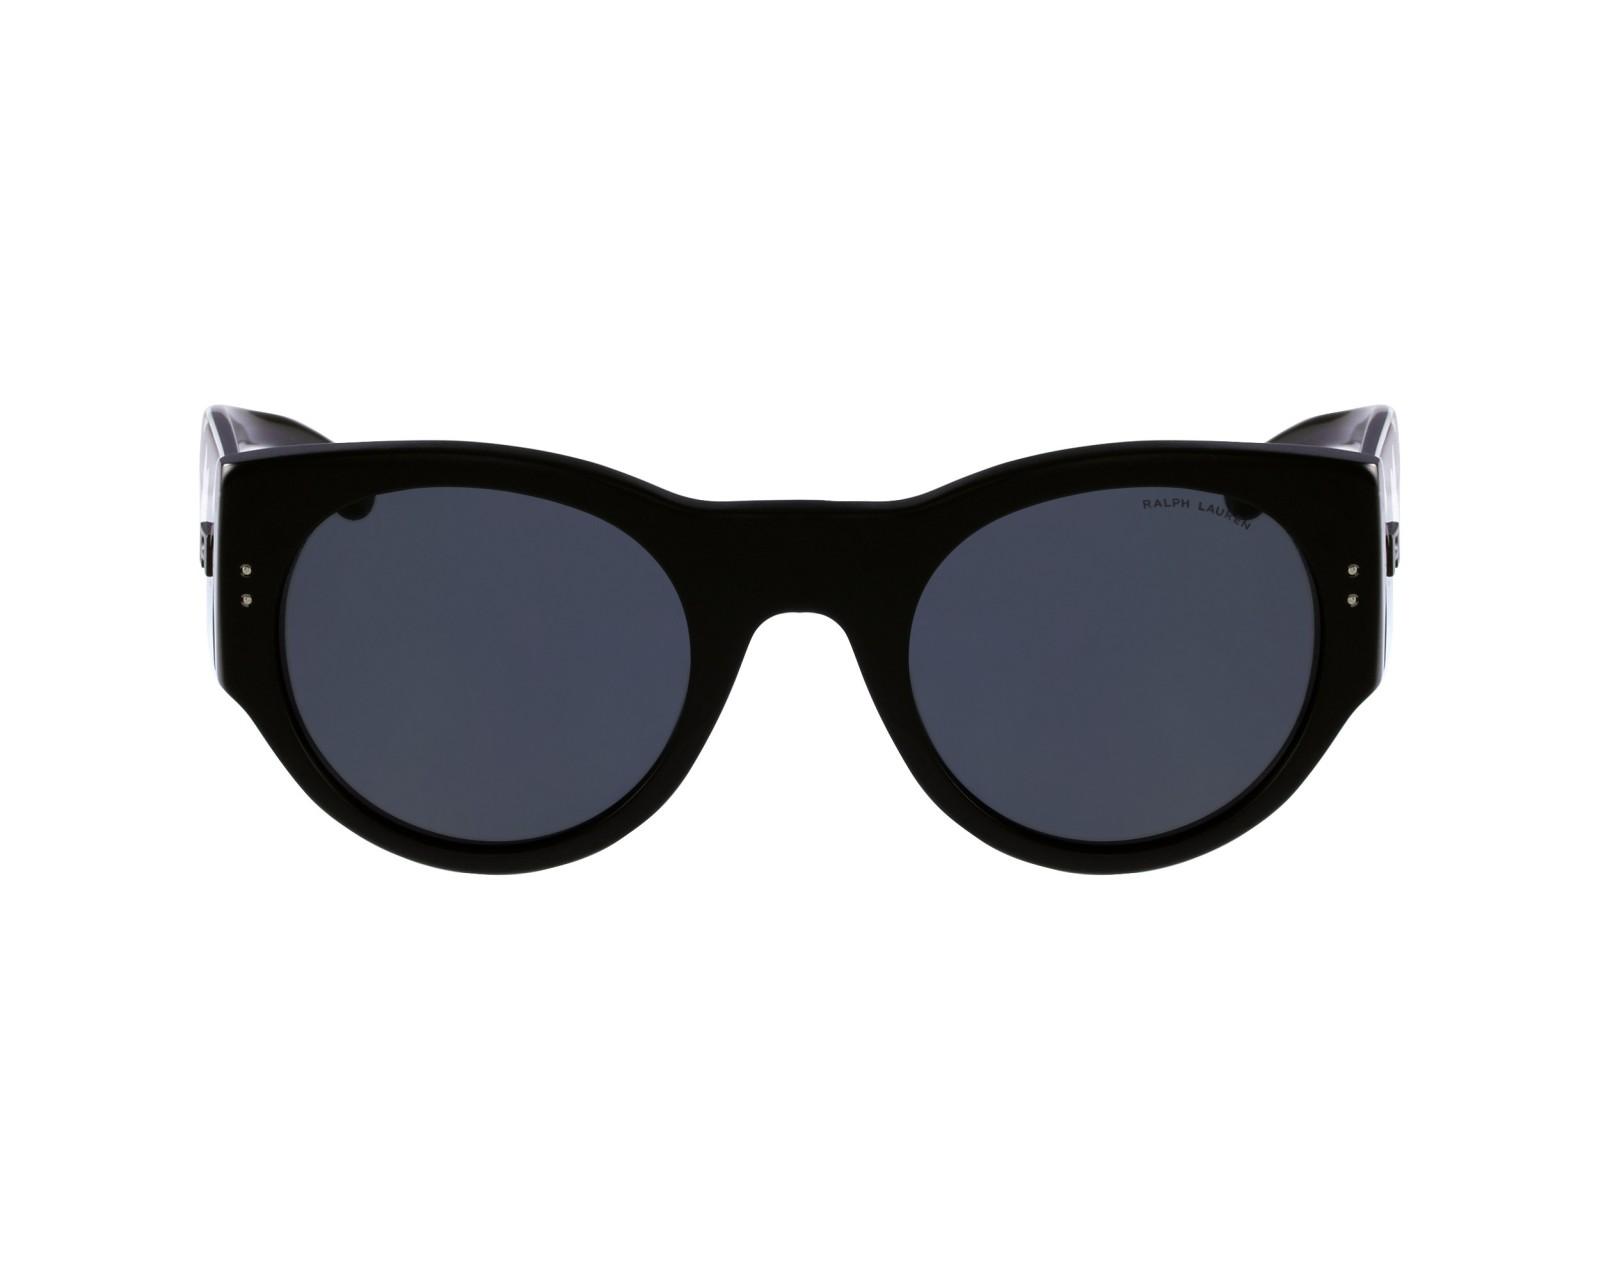 achat lunettes de soleil ralph lauren rl 8124 548187 visionet. Black Bedroom Furniture Sets. Home Design Ideas